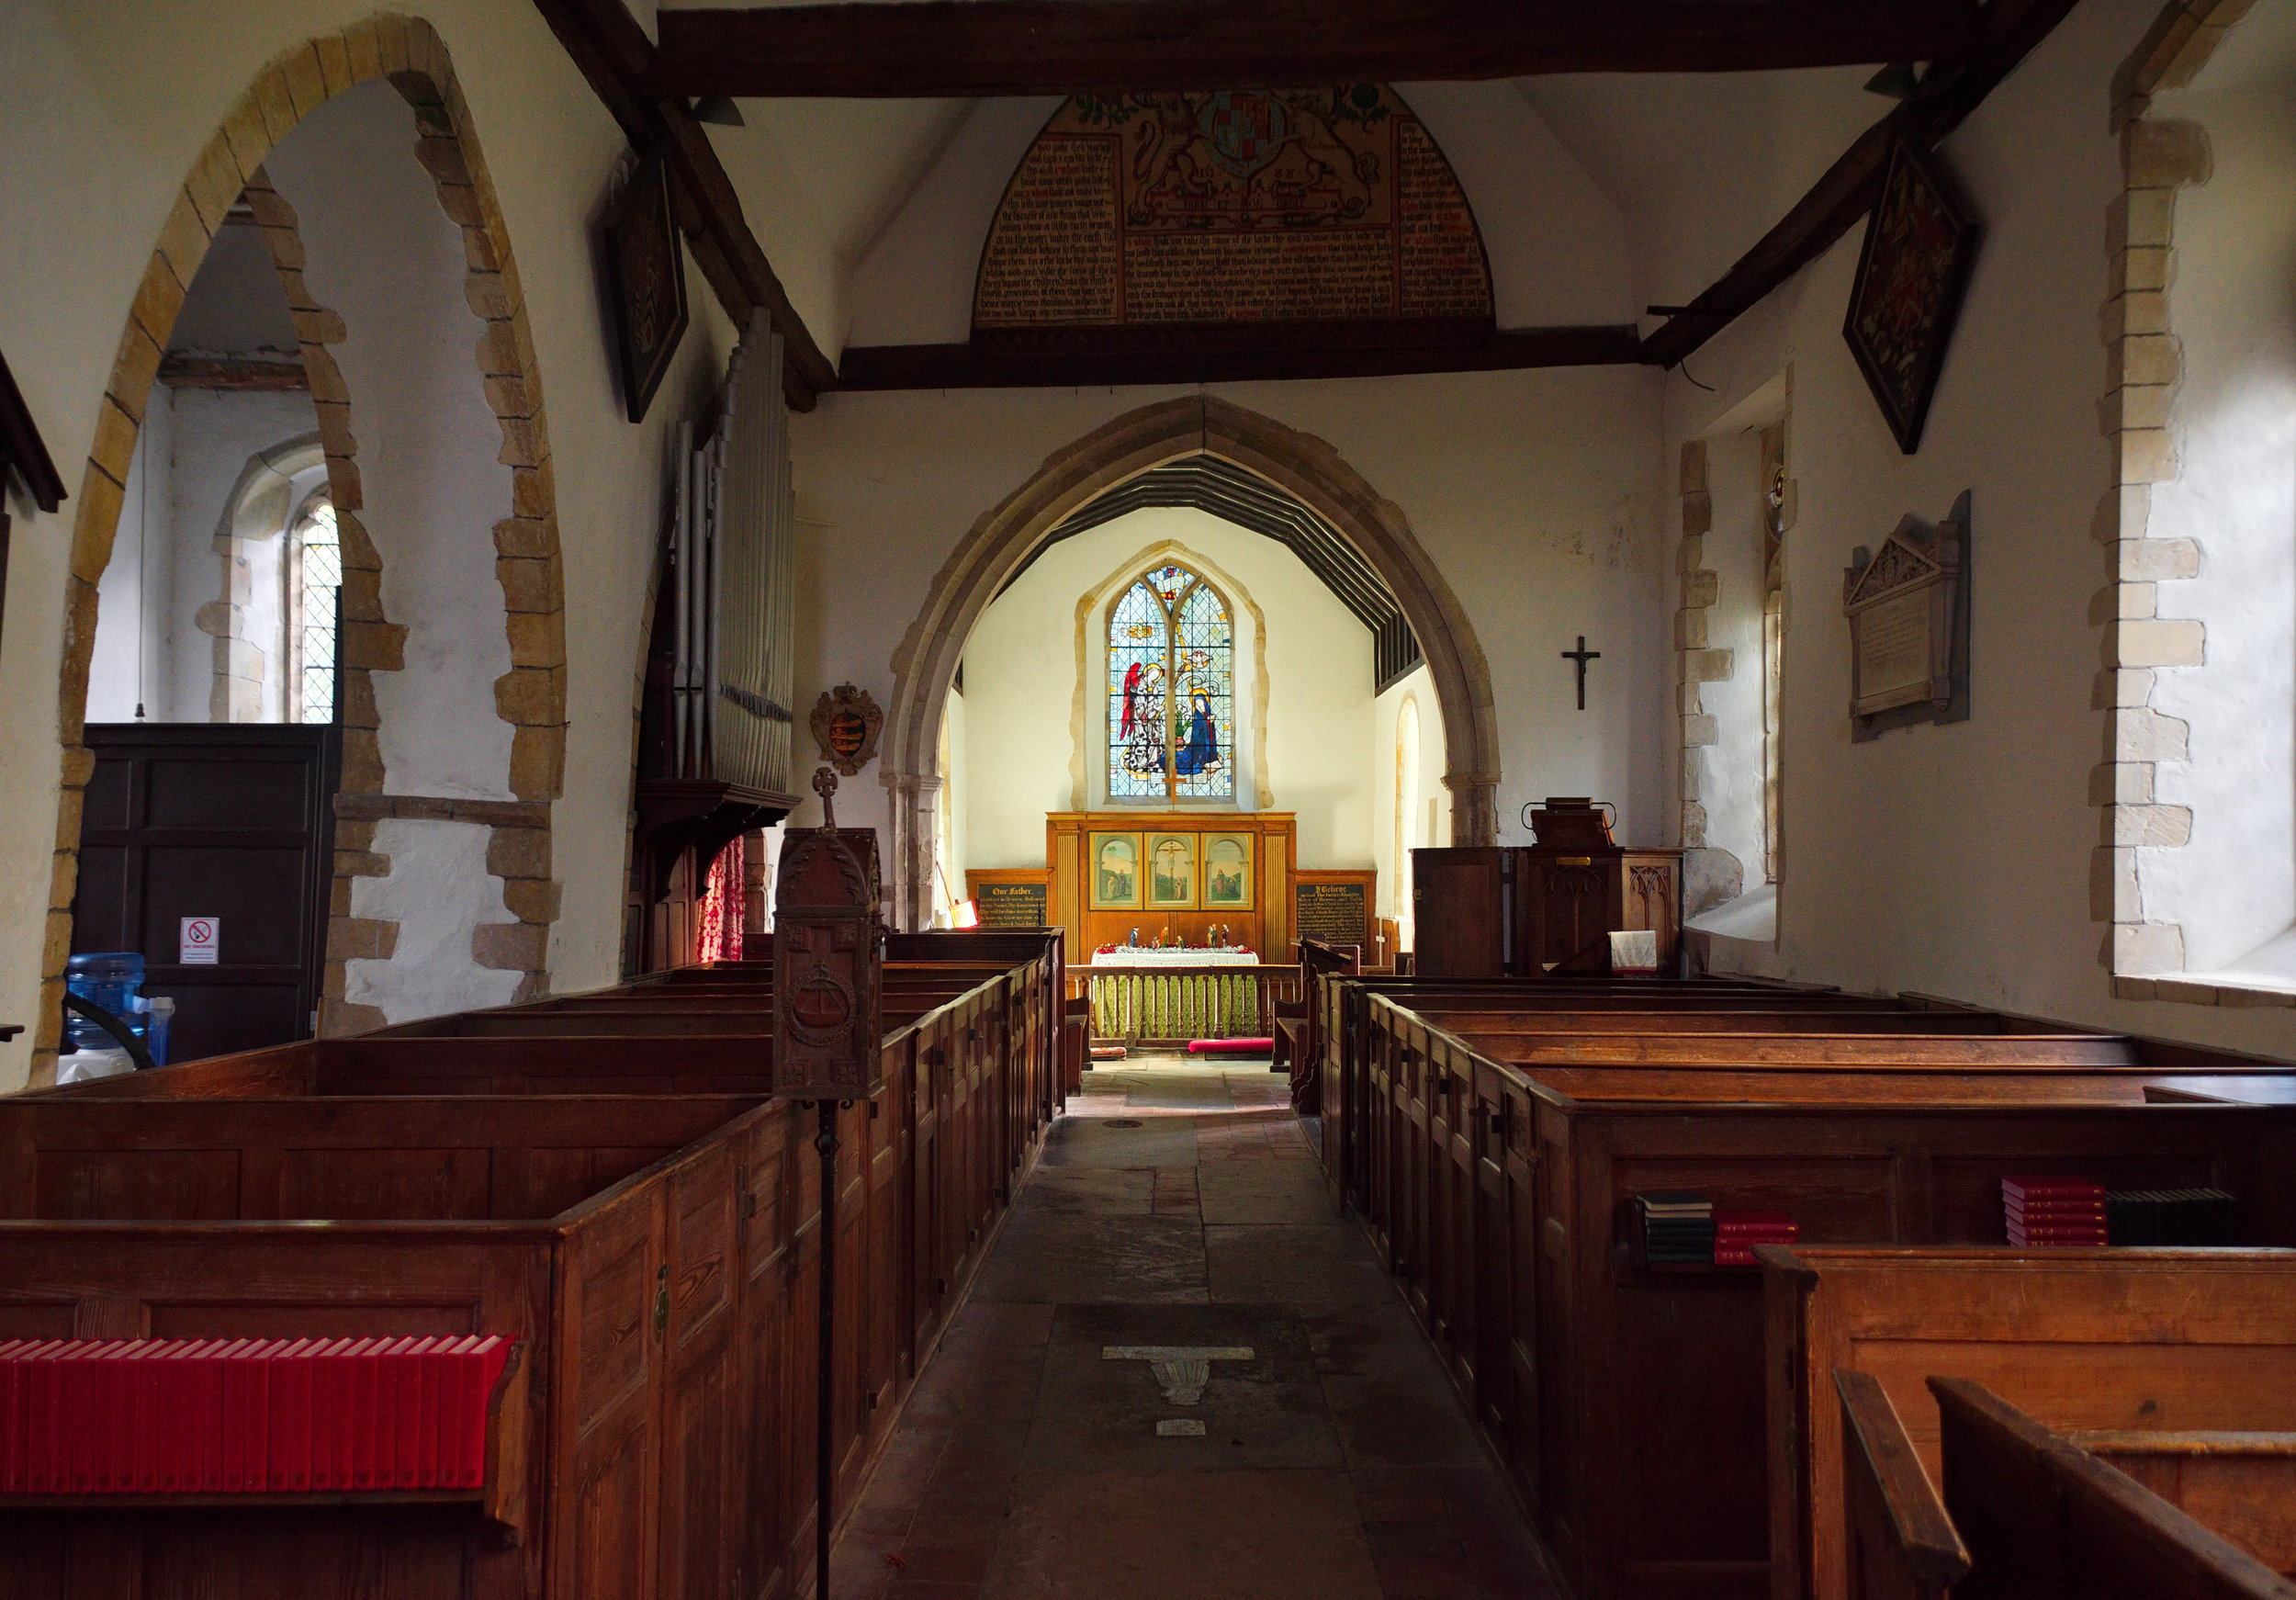 Interior, nave